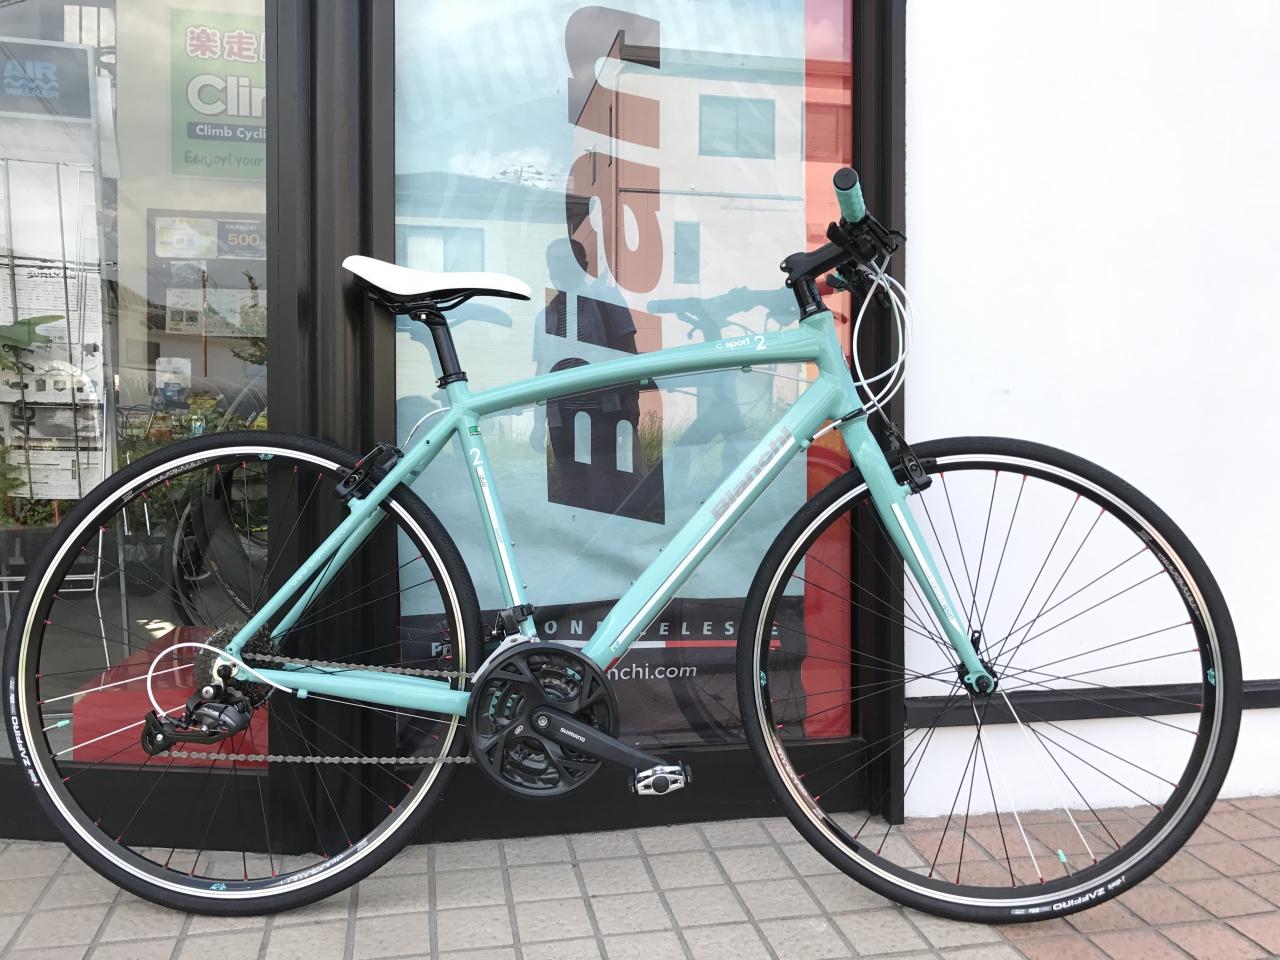 Bianchi camaleonte2 納車…from Uさま!